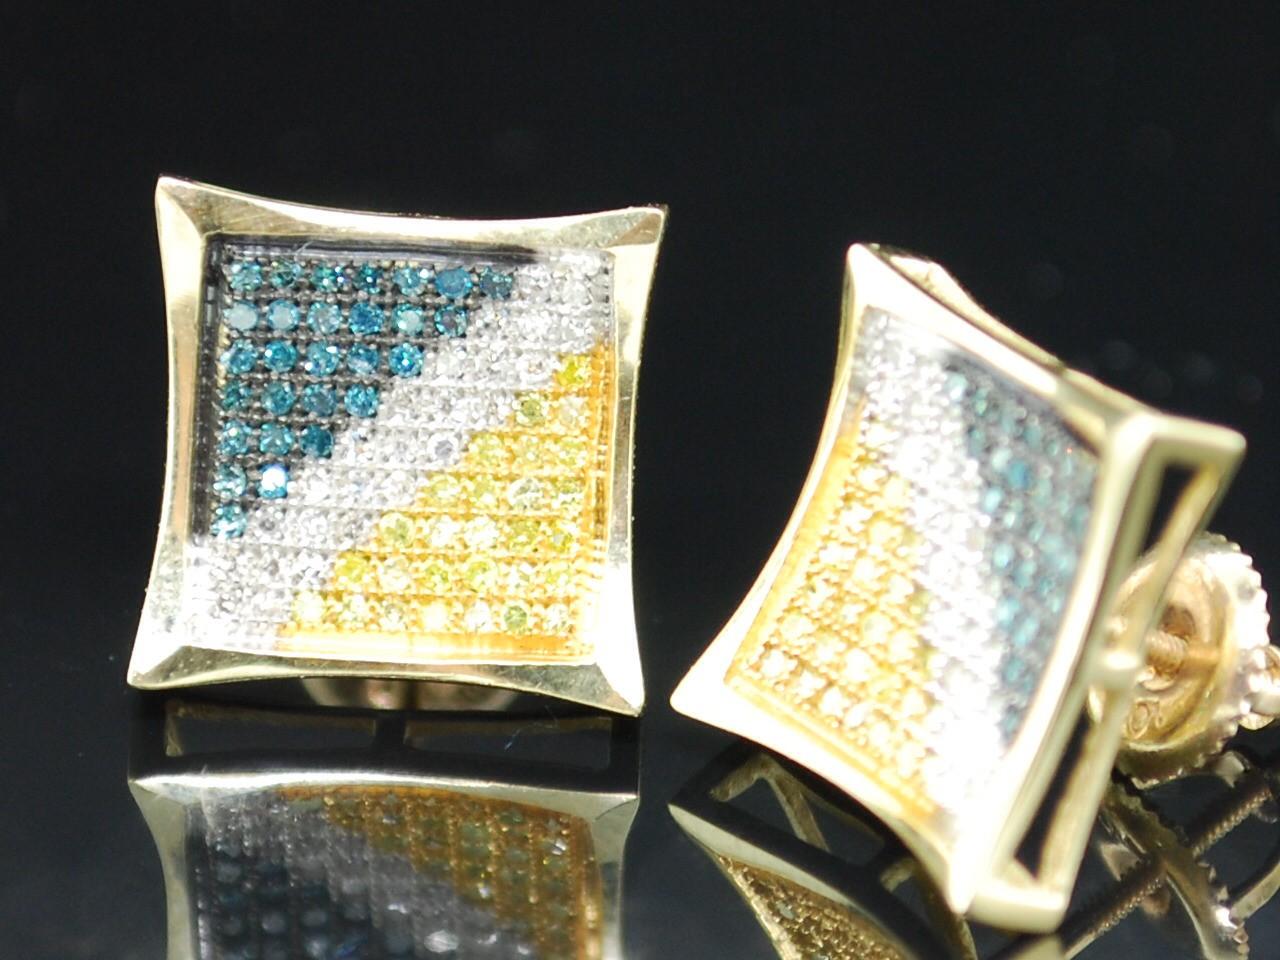 MENS/LADIES YELLOW GOLD .5C DIAMOND KITE STUD EARRINGS